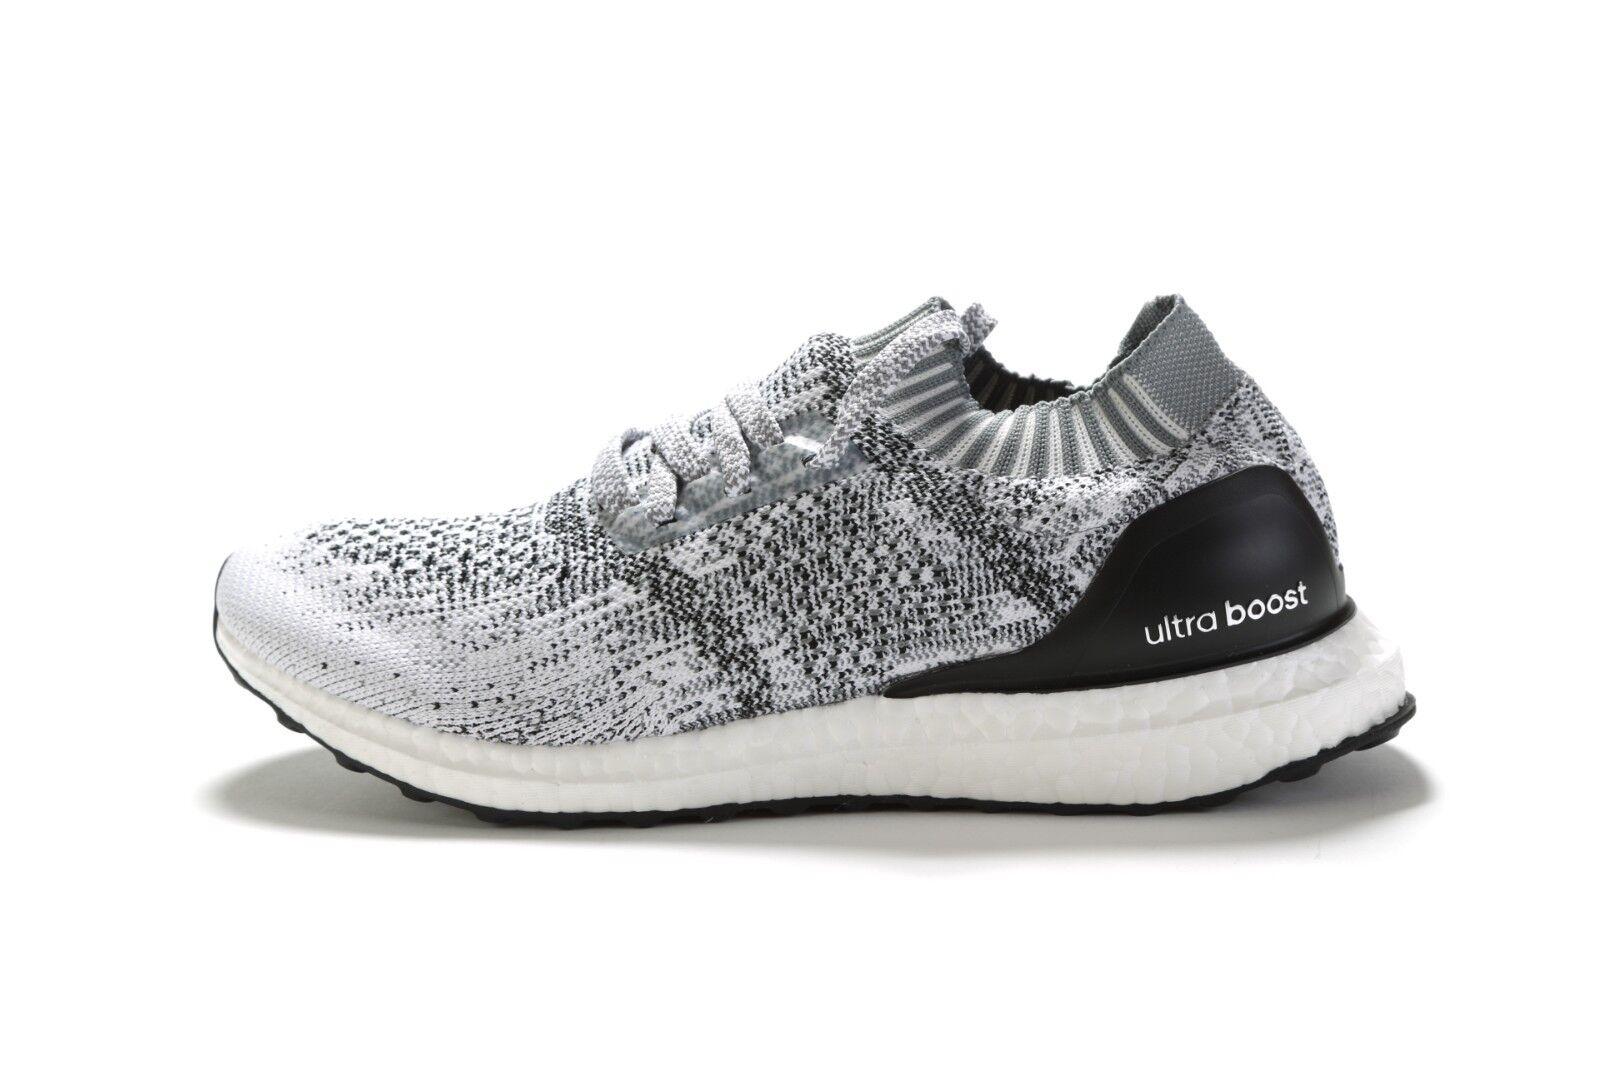 Mens adidas Ultraboost Uncaged Size 8.5 Oreo Cg4095 White Black ... 43262cc77